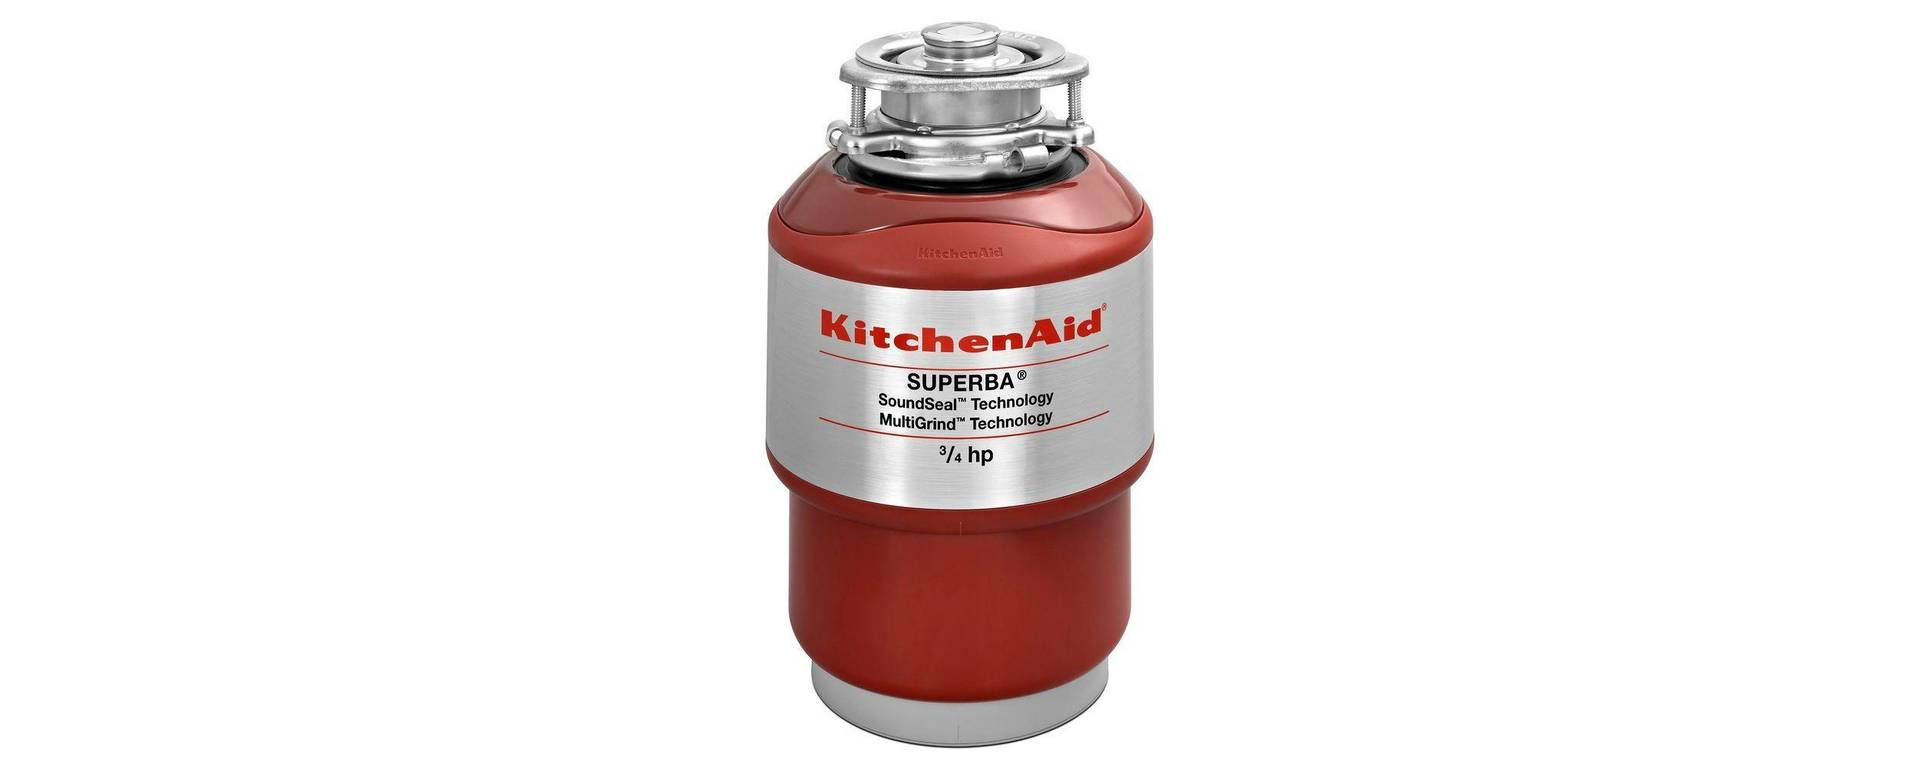 KitchenAid Superba KCDS075T